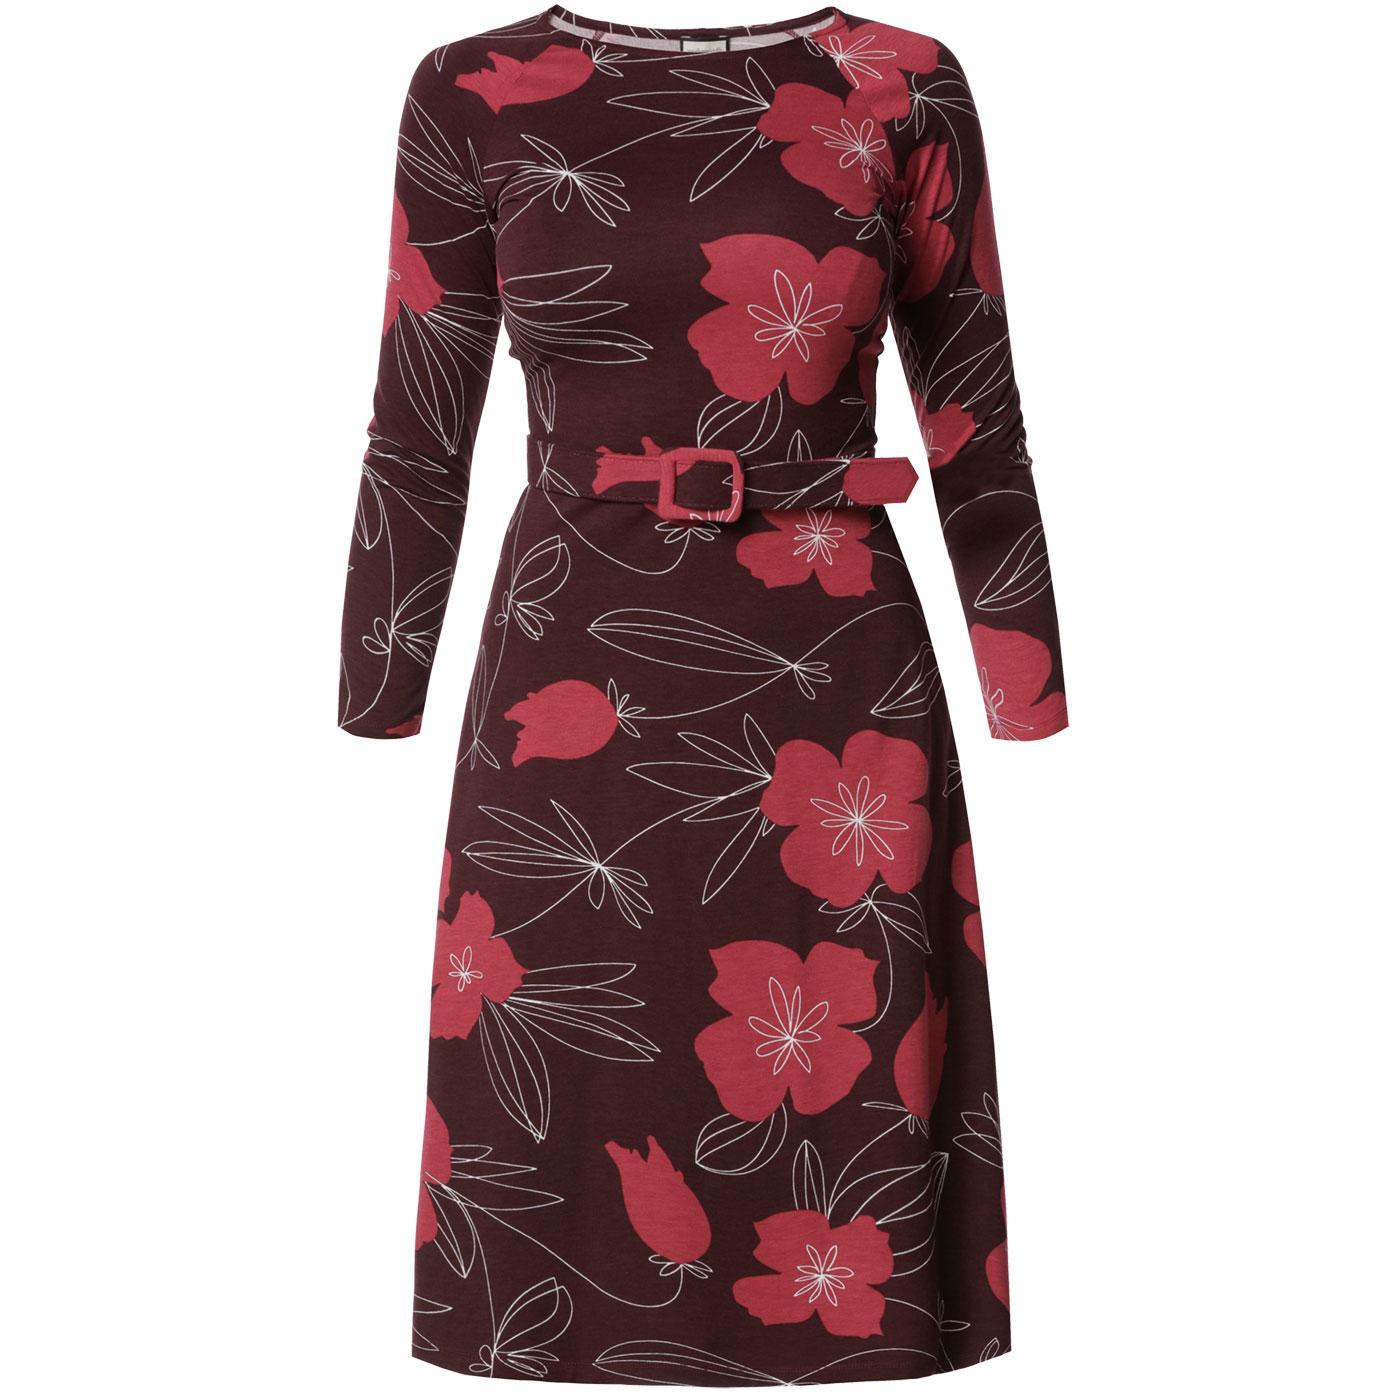 Let The Leaves Dance MADEMOISELLE YEYE 60's Dress